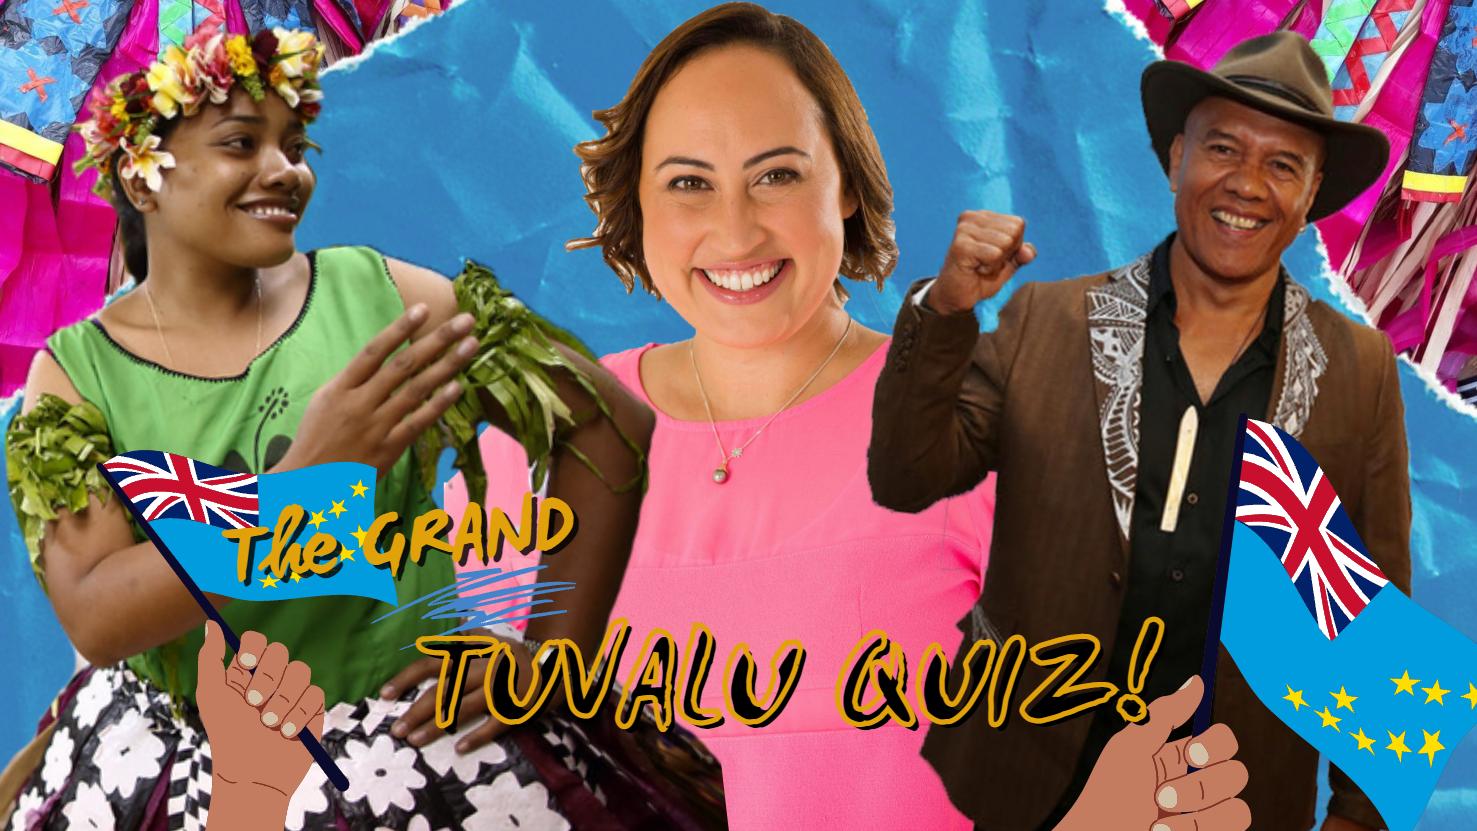 The Grand Tuvalu Quiz! How do you think you'll do?